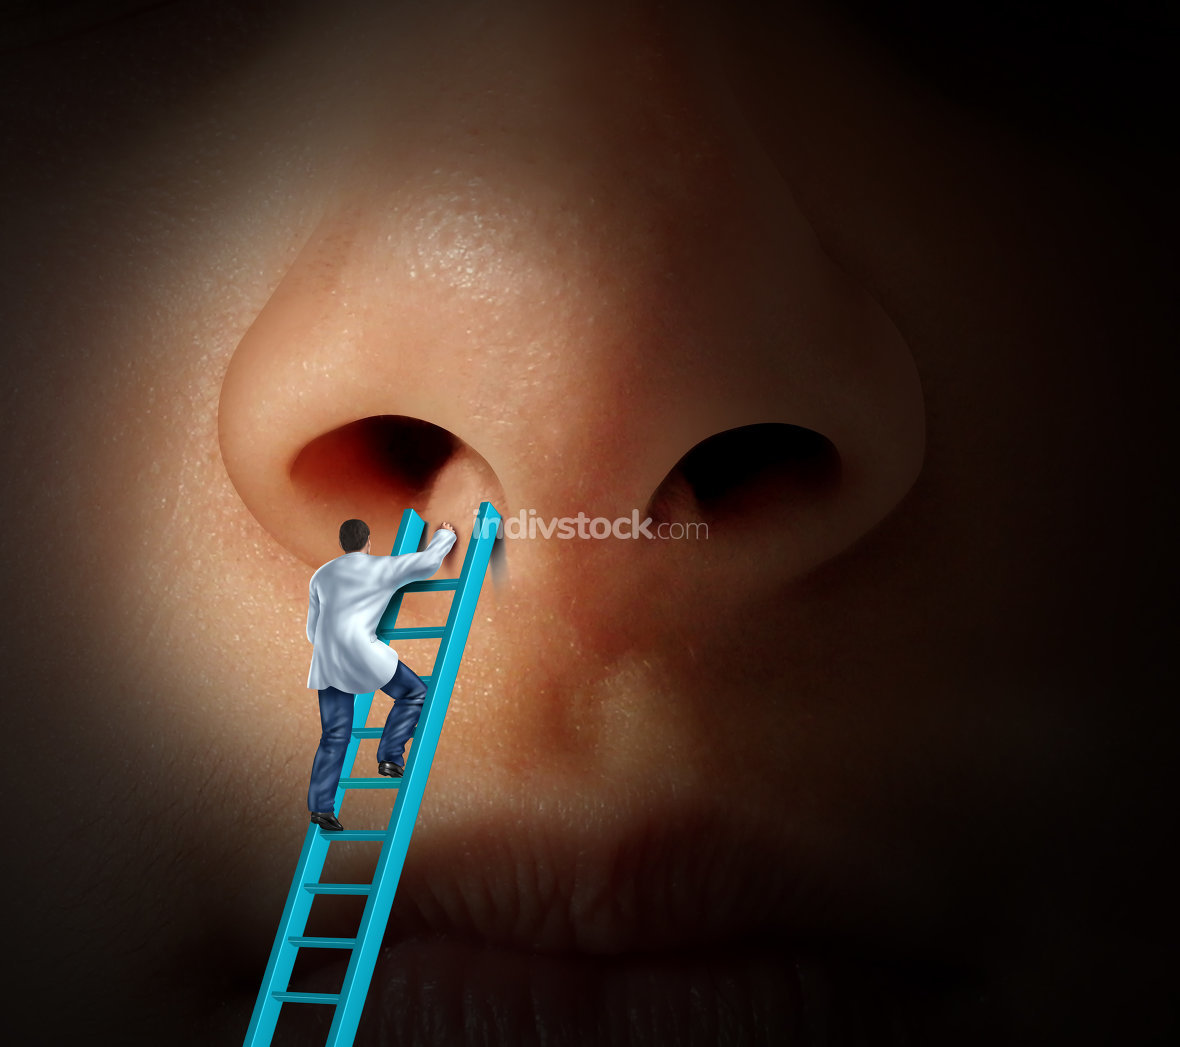 Medical Nose Care